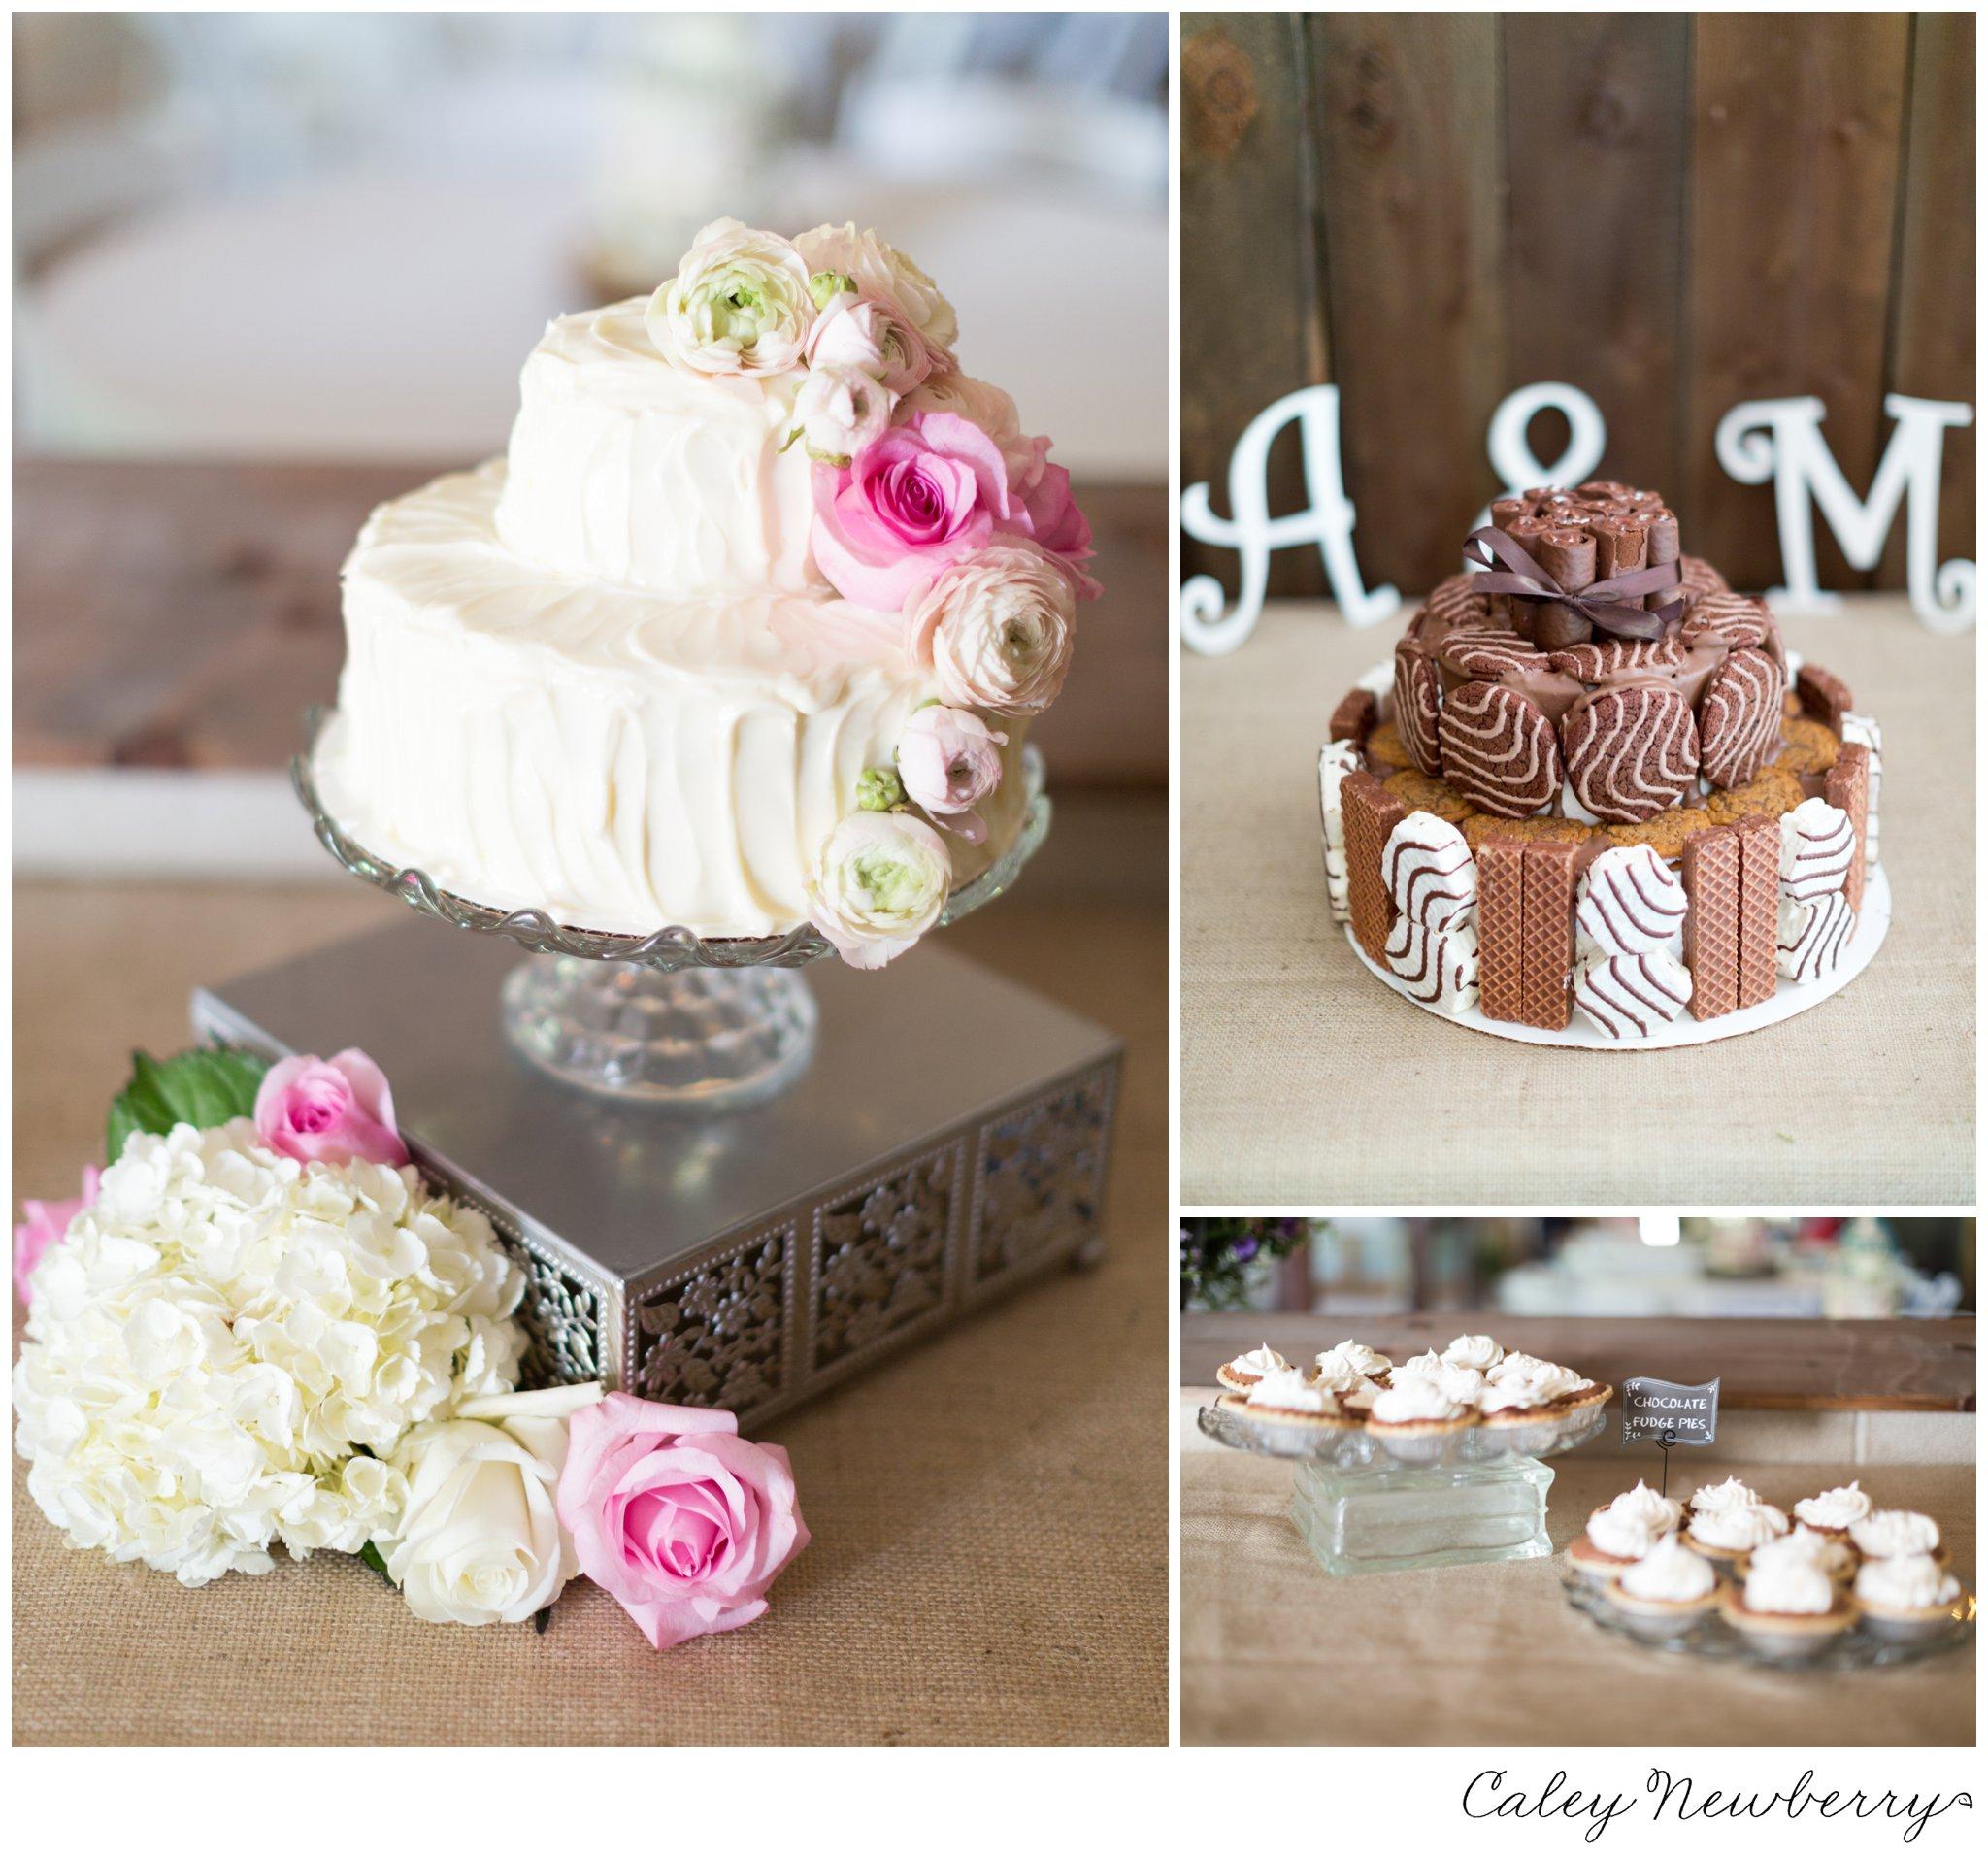 ribbons-of-chocolate-nashville-cake.jpg